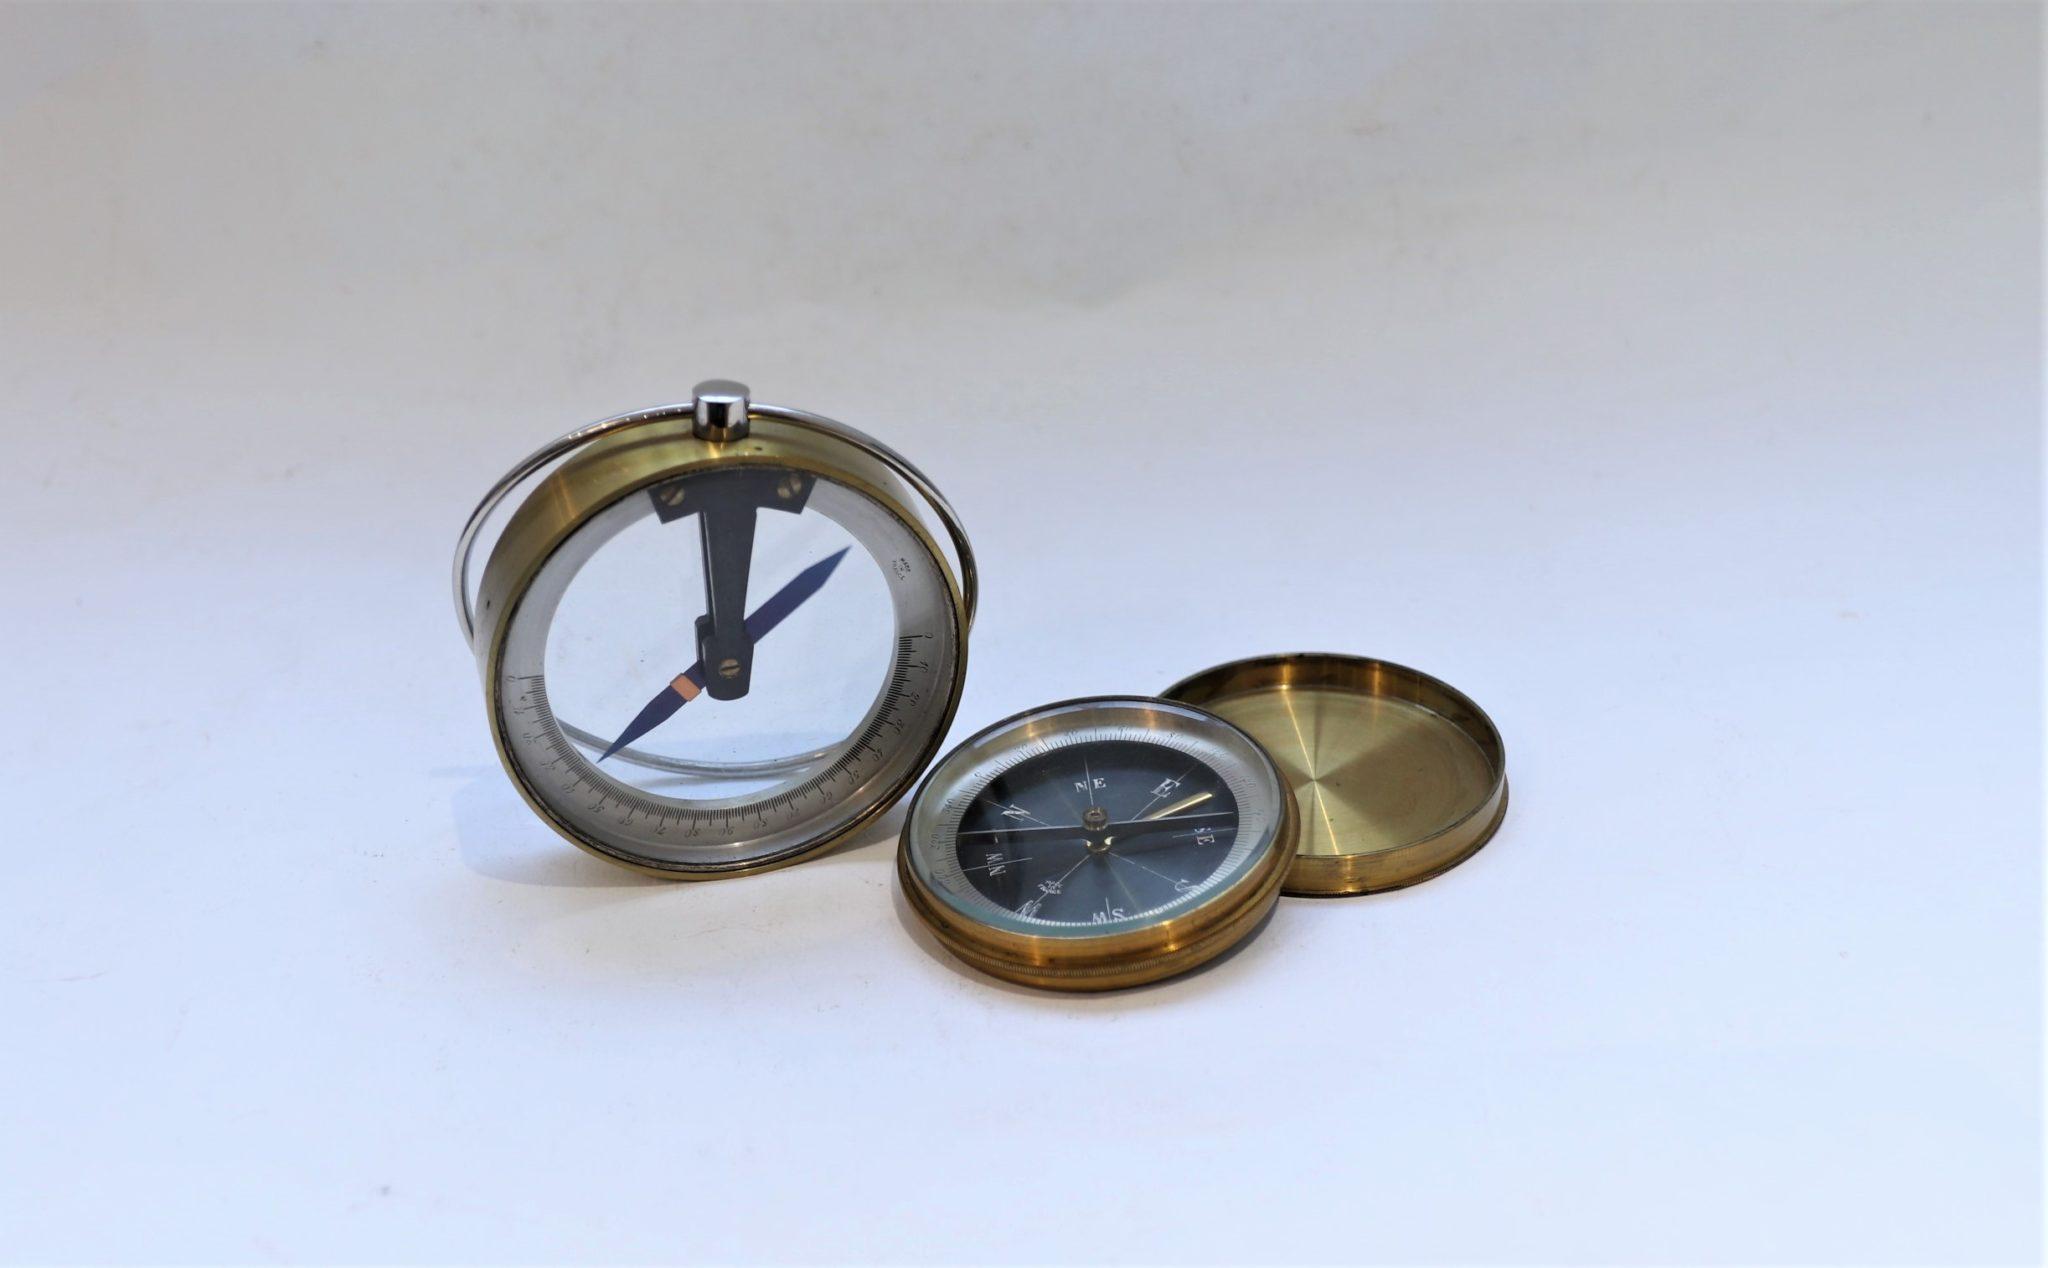 French portable dip circle, plus portable compass for UK market, circa 1880